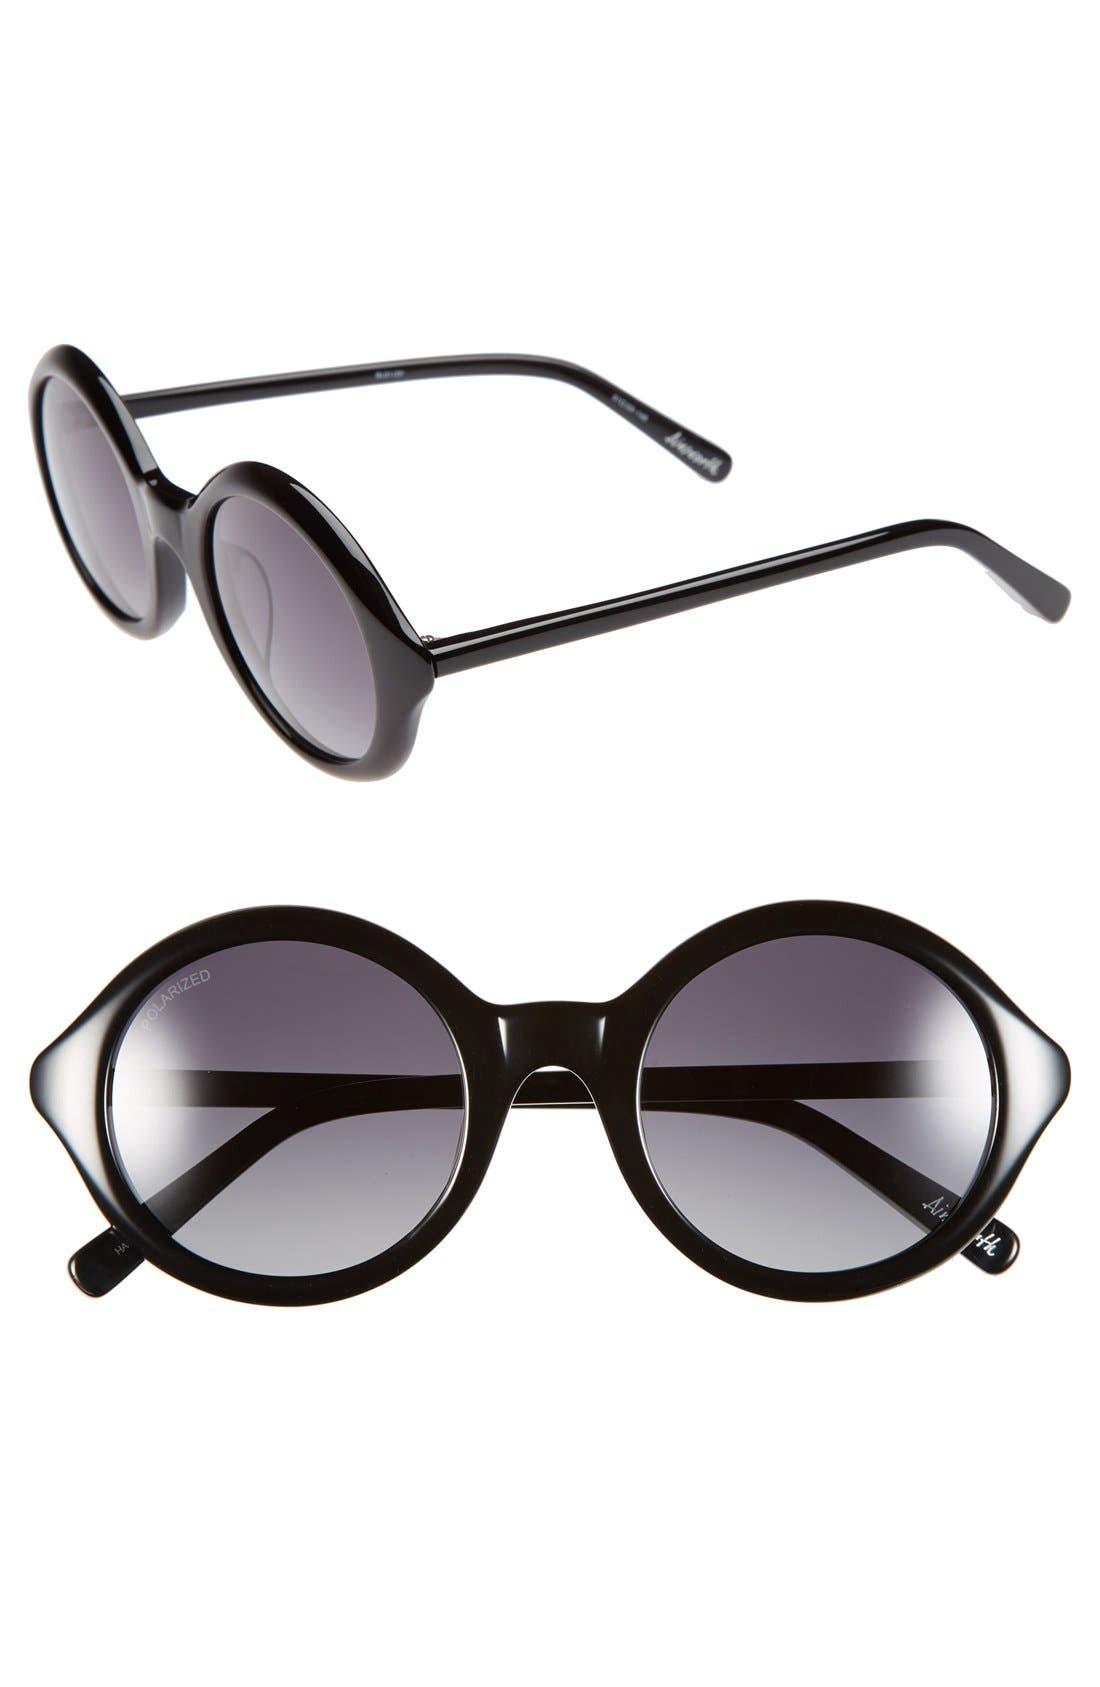 Main Image - Elizabeth and James 'Ainsworth' 51mm Polarized Sunglasses